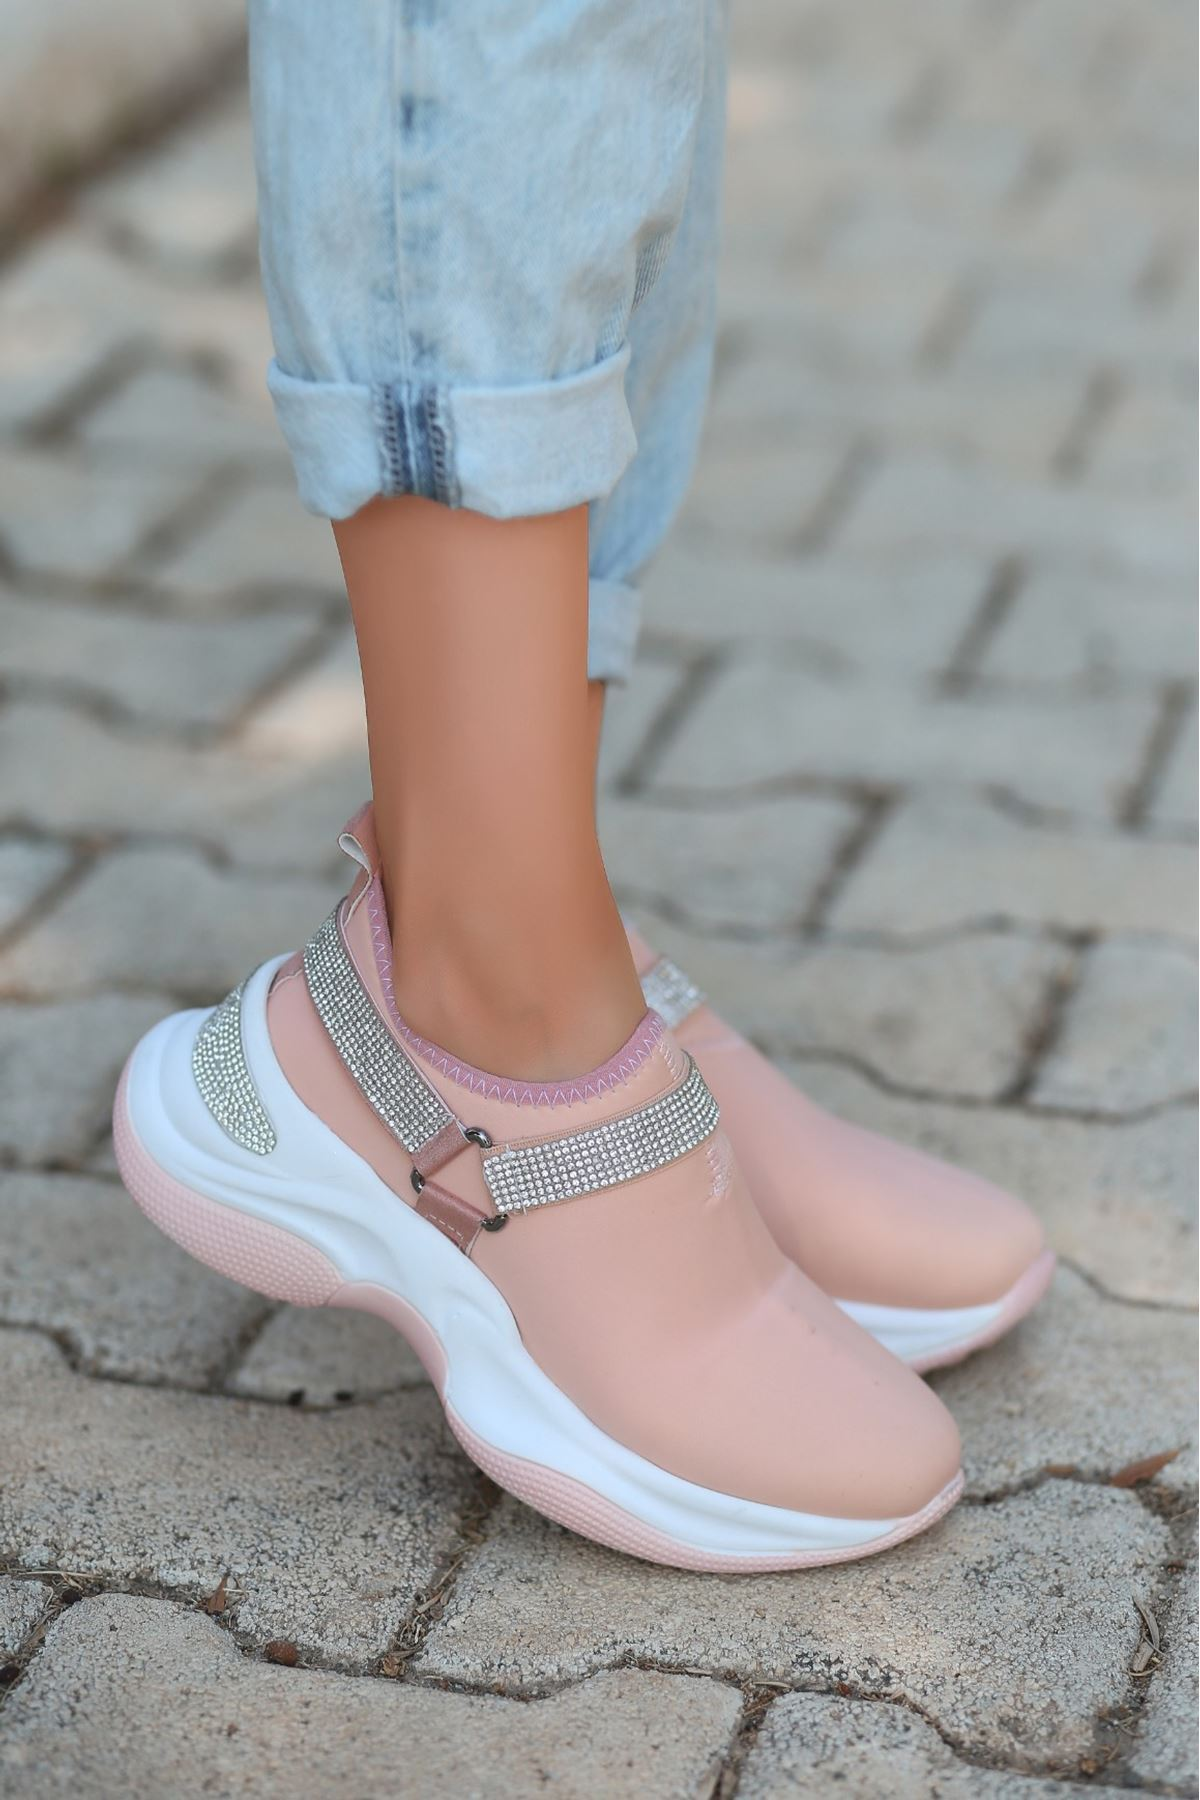 Gist Pudra Boncuklu Spor Ayakkabı